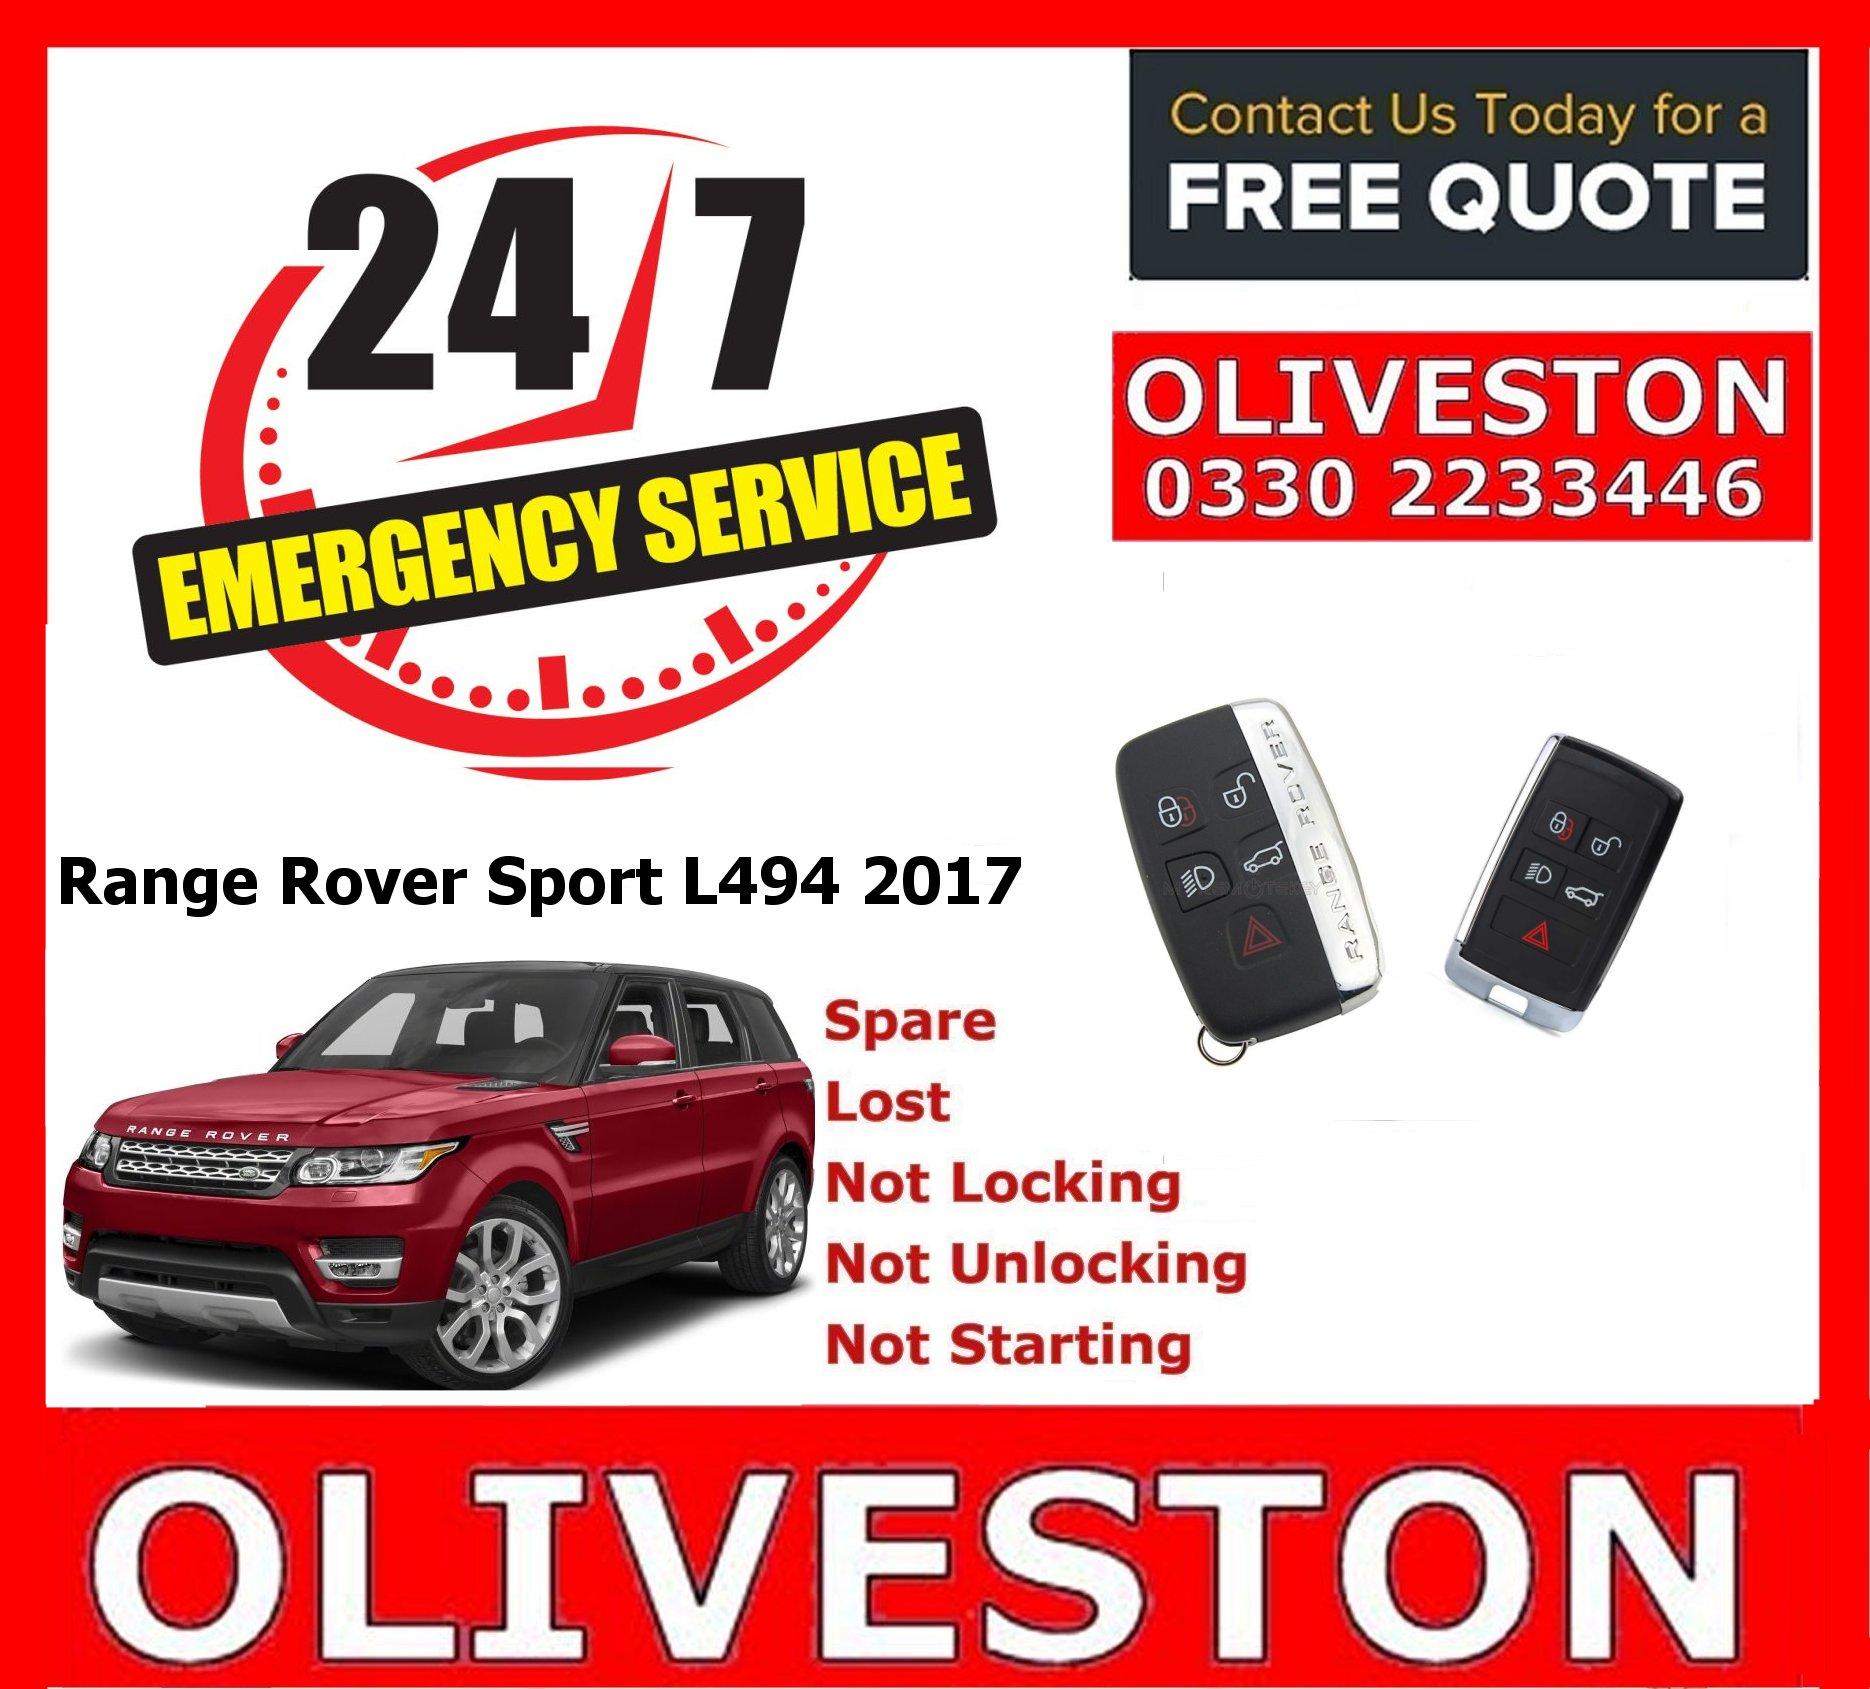 Range Rover Land Rover Jaguar Spare lost keys Newton Aycliffe Corsett Bishop Auckland Seaham Stanley Spennymoor Annfield Plain Brandon Shildon Crook Ferryhill Durham North East